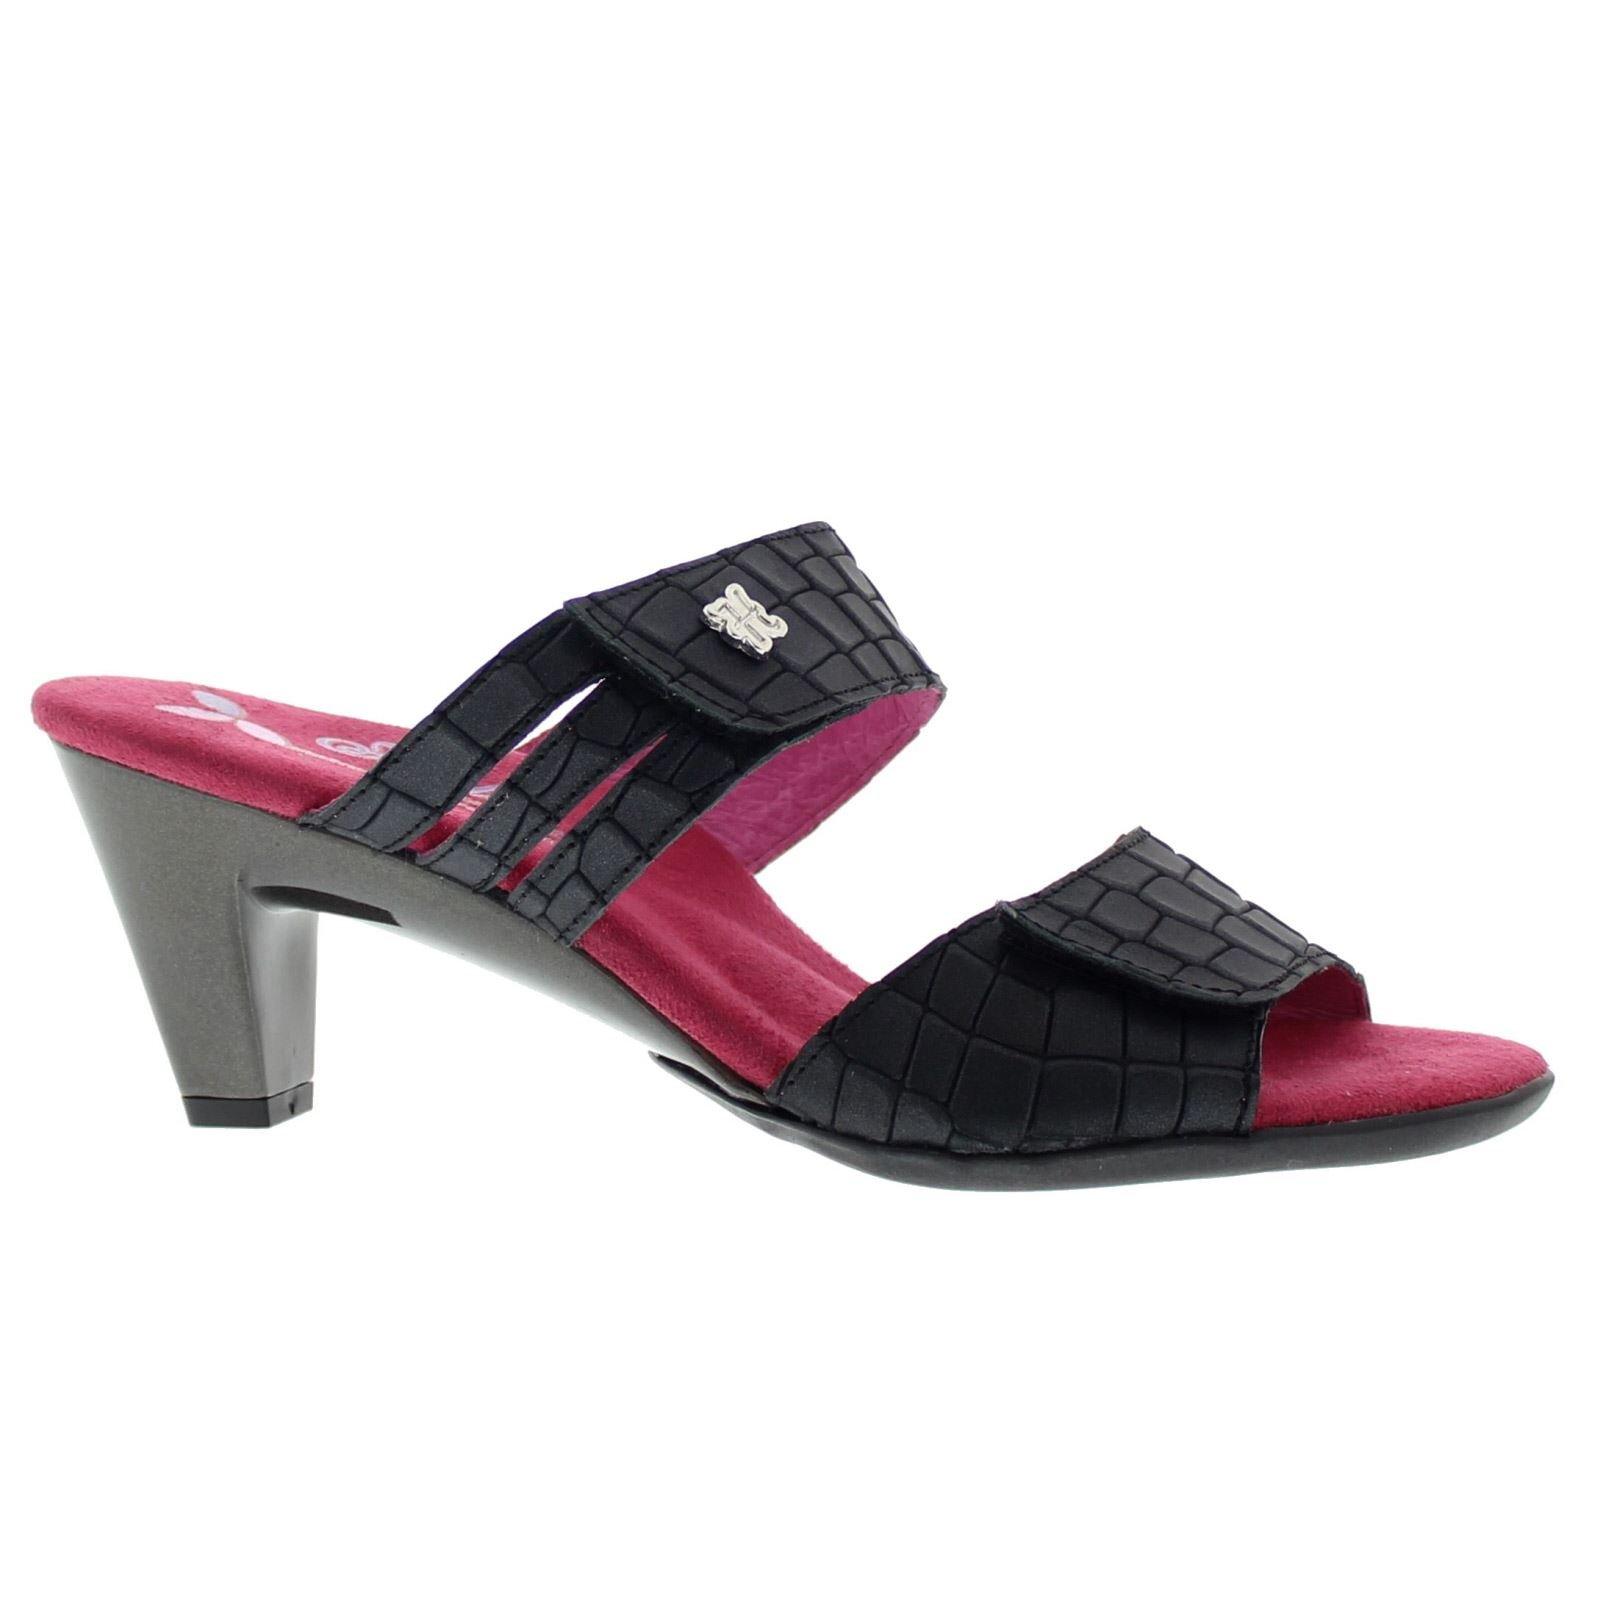 Helle Comfort Helle Fashion Comfort Women's Ela Black 2 Velcro Slide Size 40